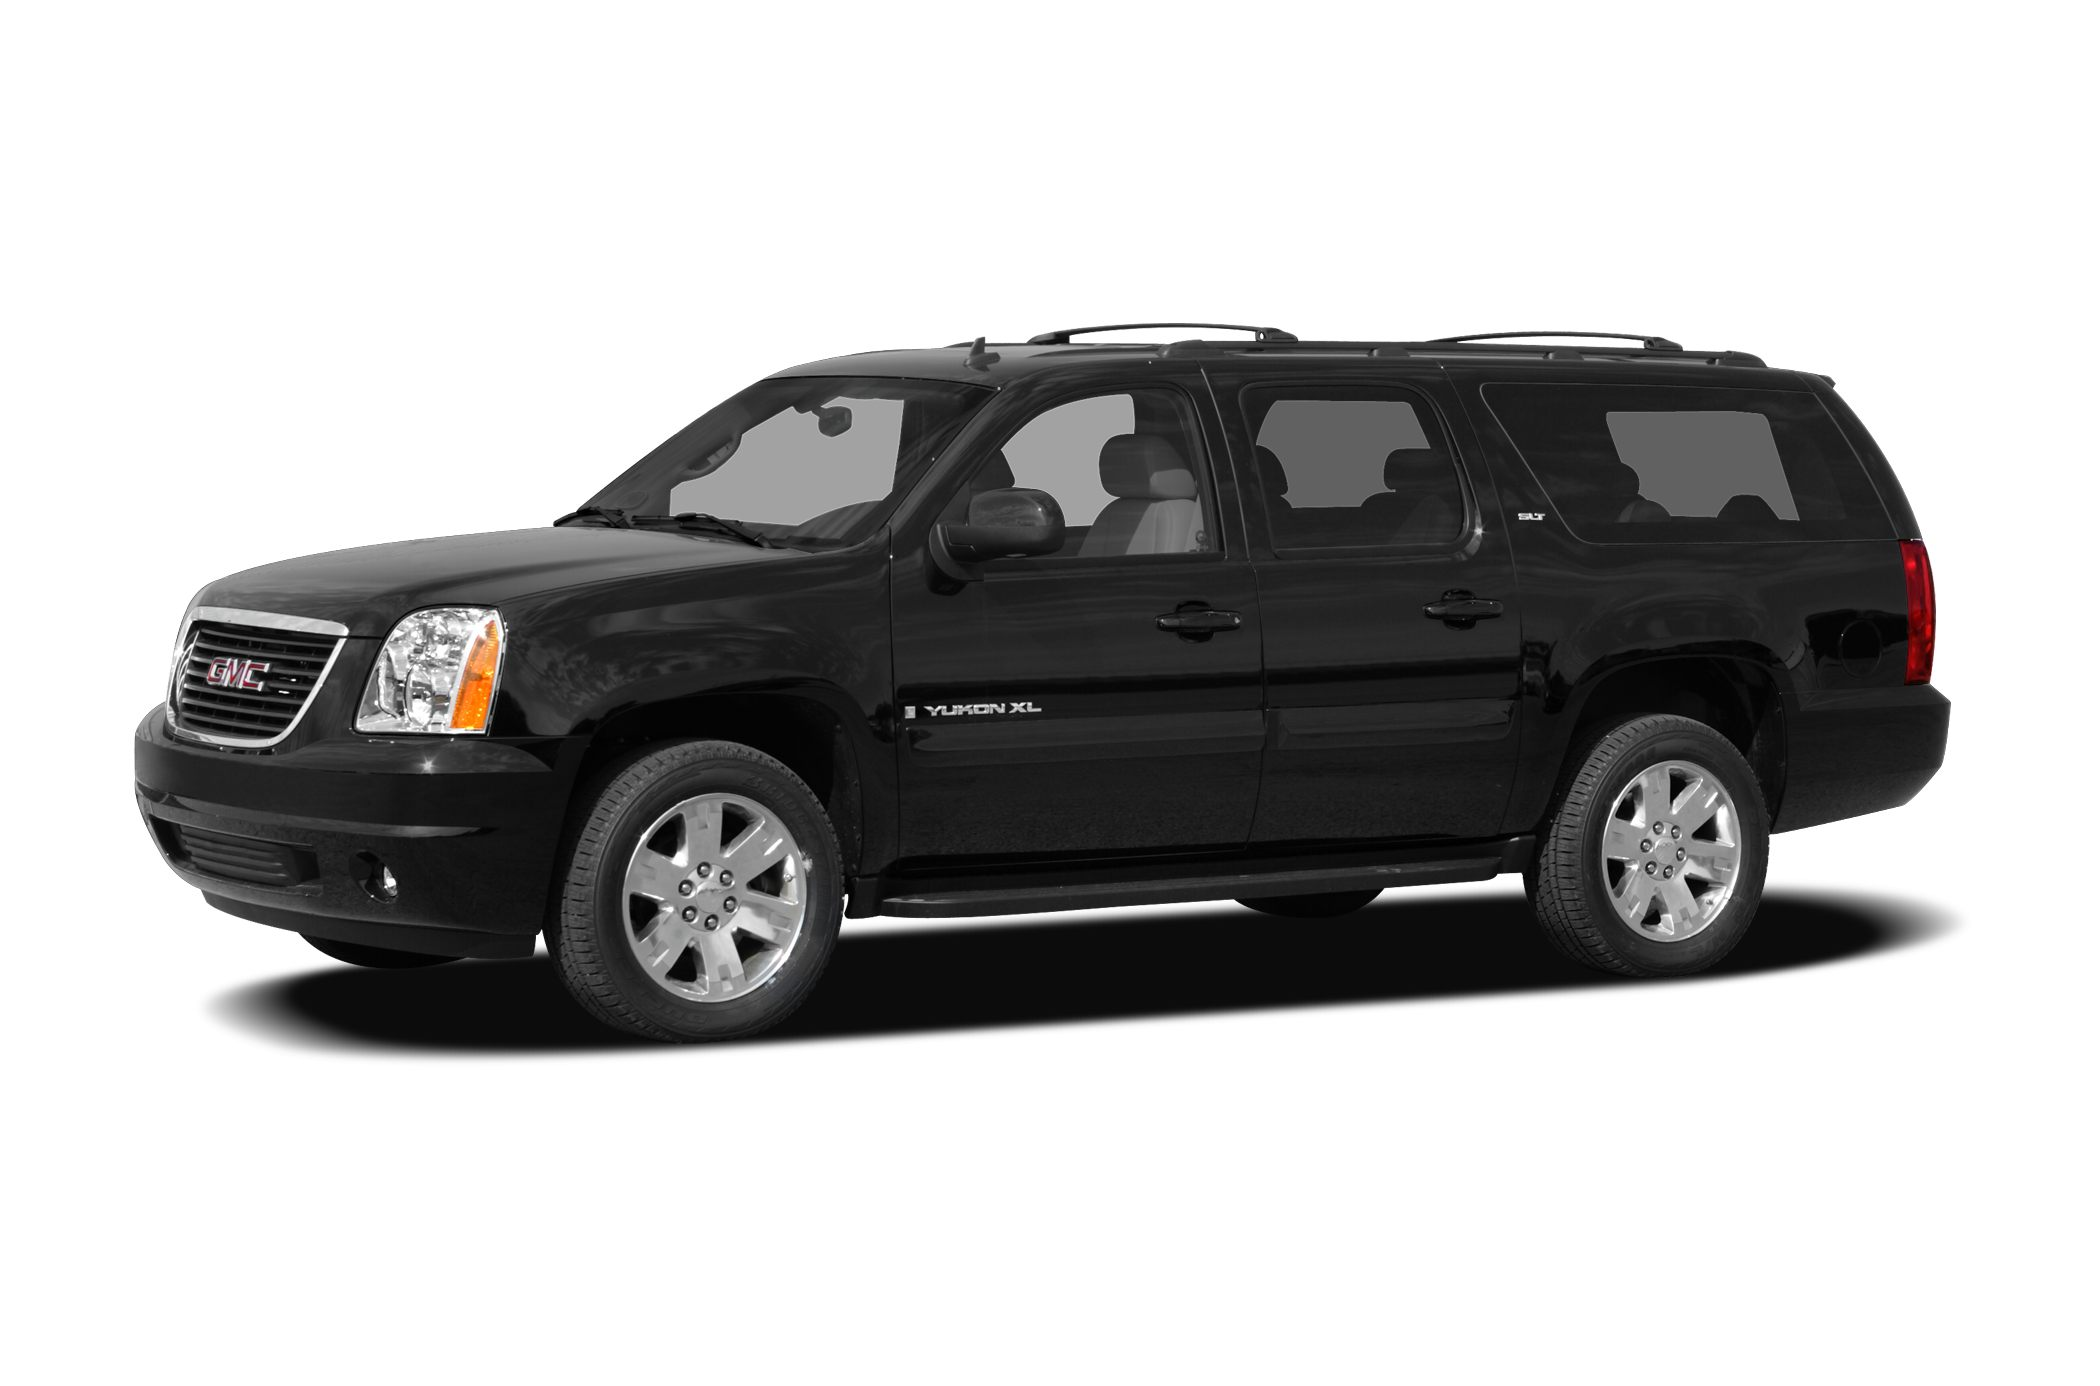 2008 Gmc Yukon Xl 1500 Pricing And Specs